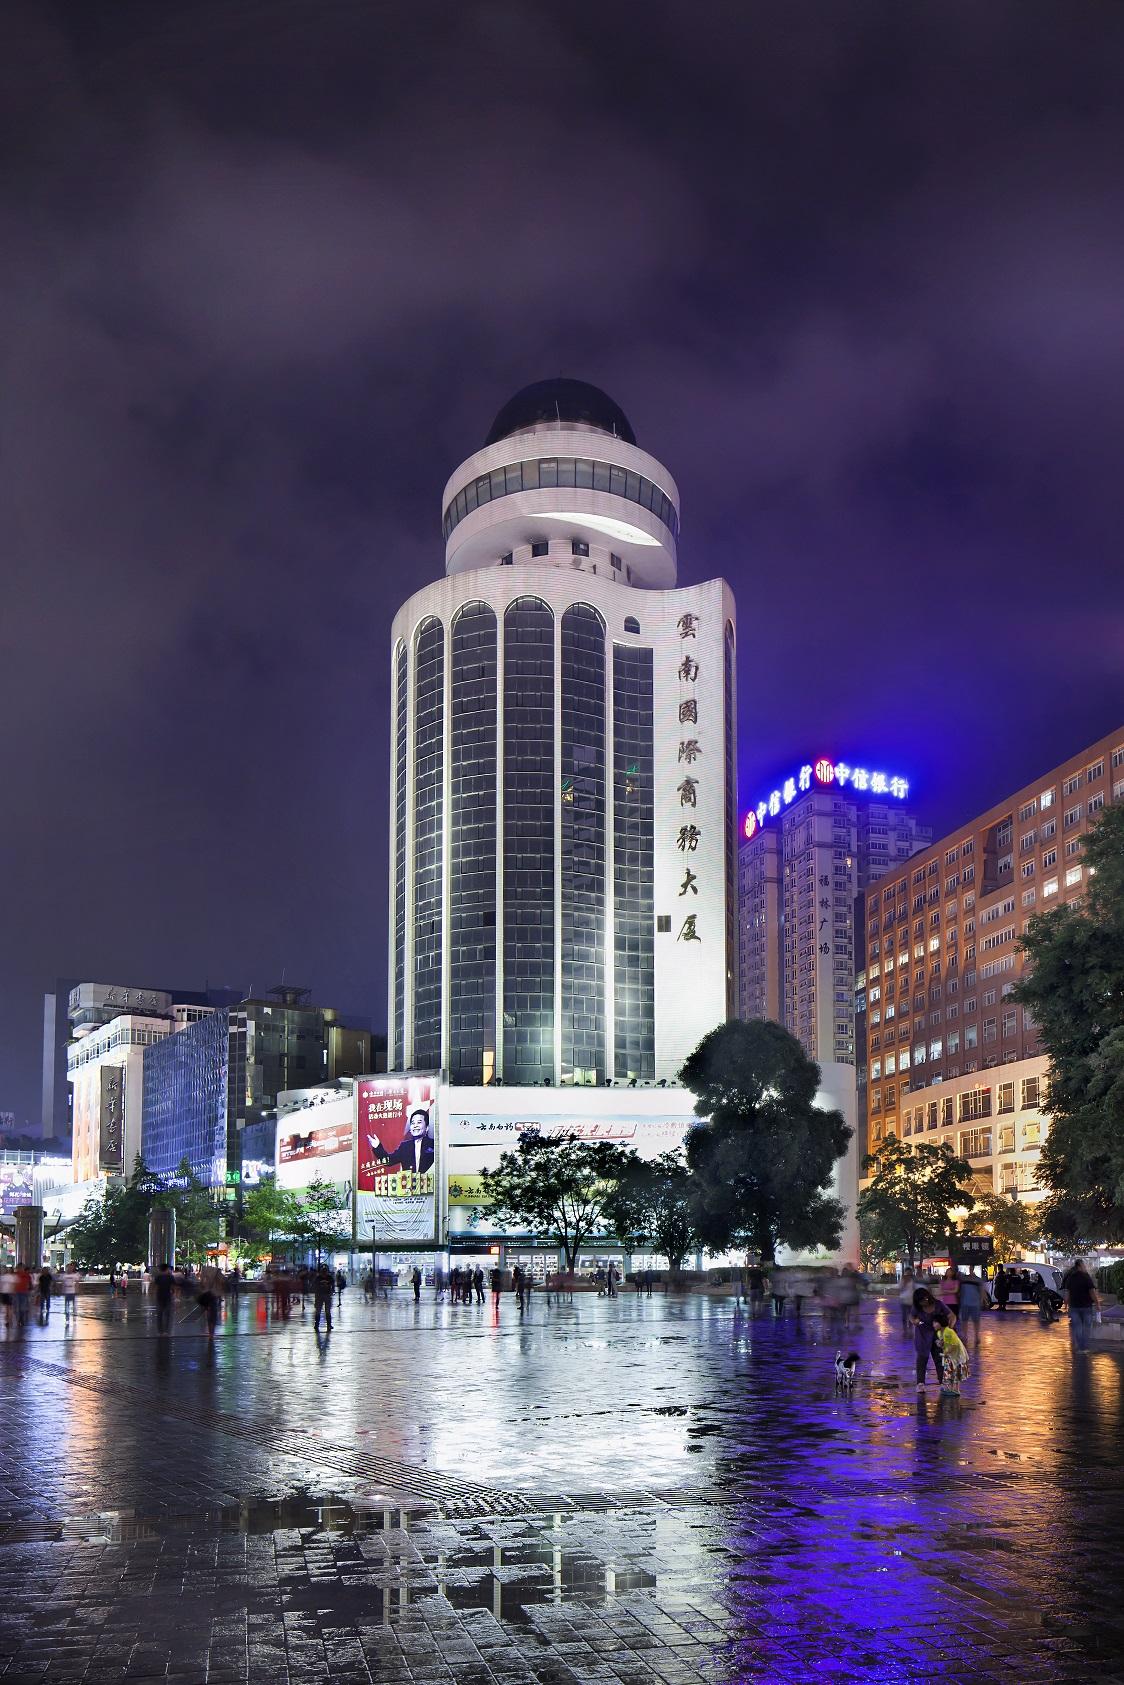 Kunming shopping mall